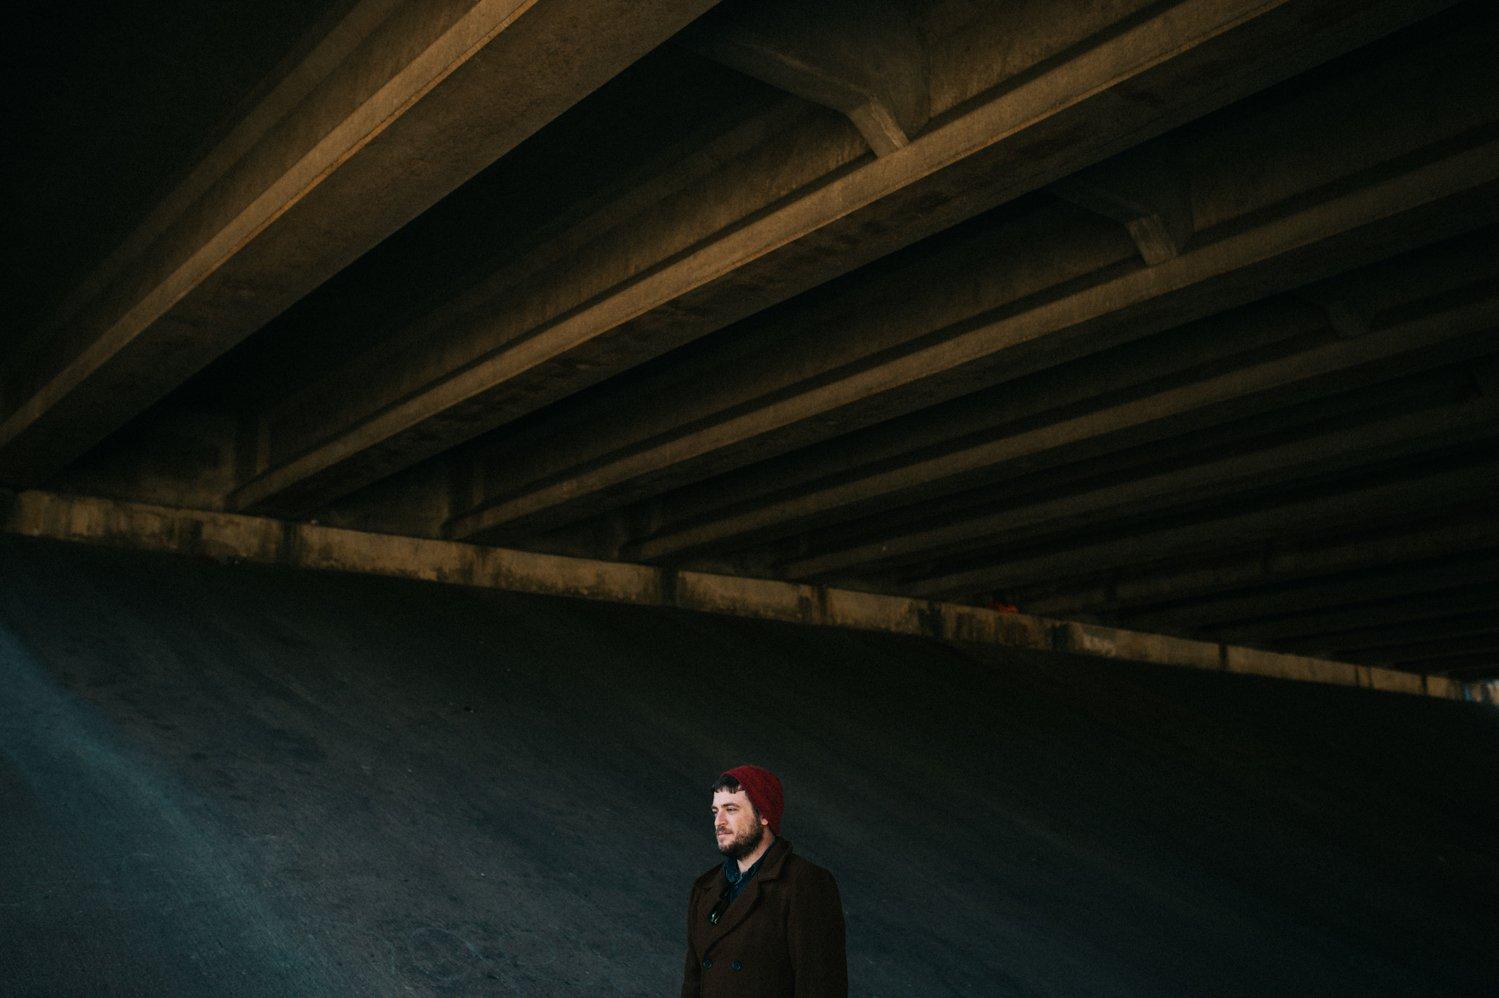 USA ROADTRIP TRAVEL PHOTOGRAPHY-8